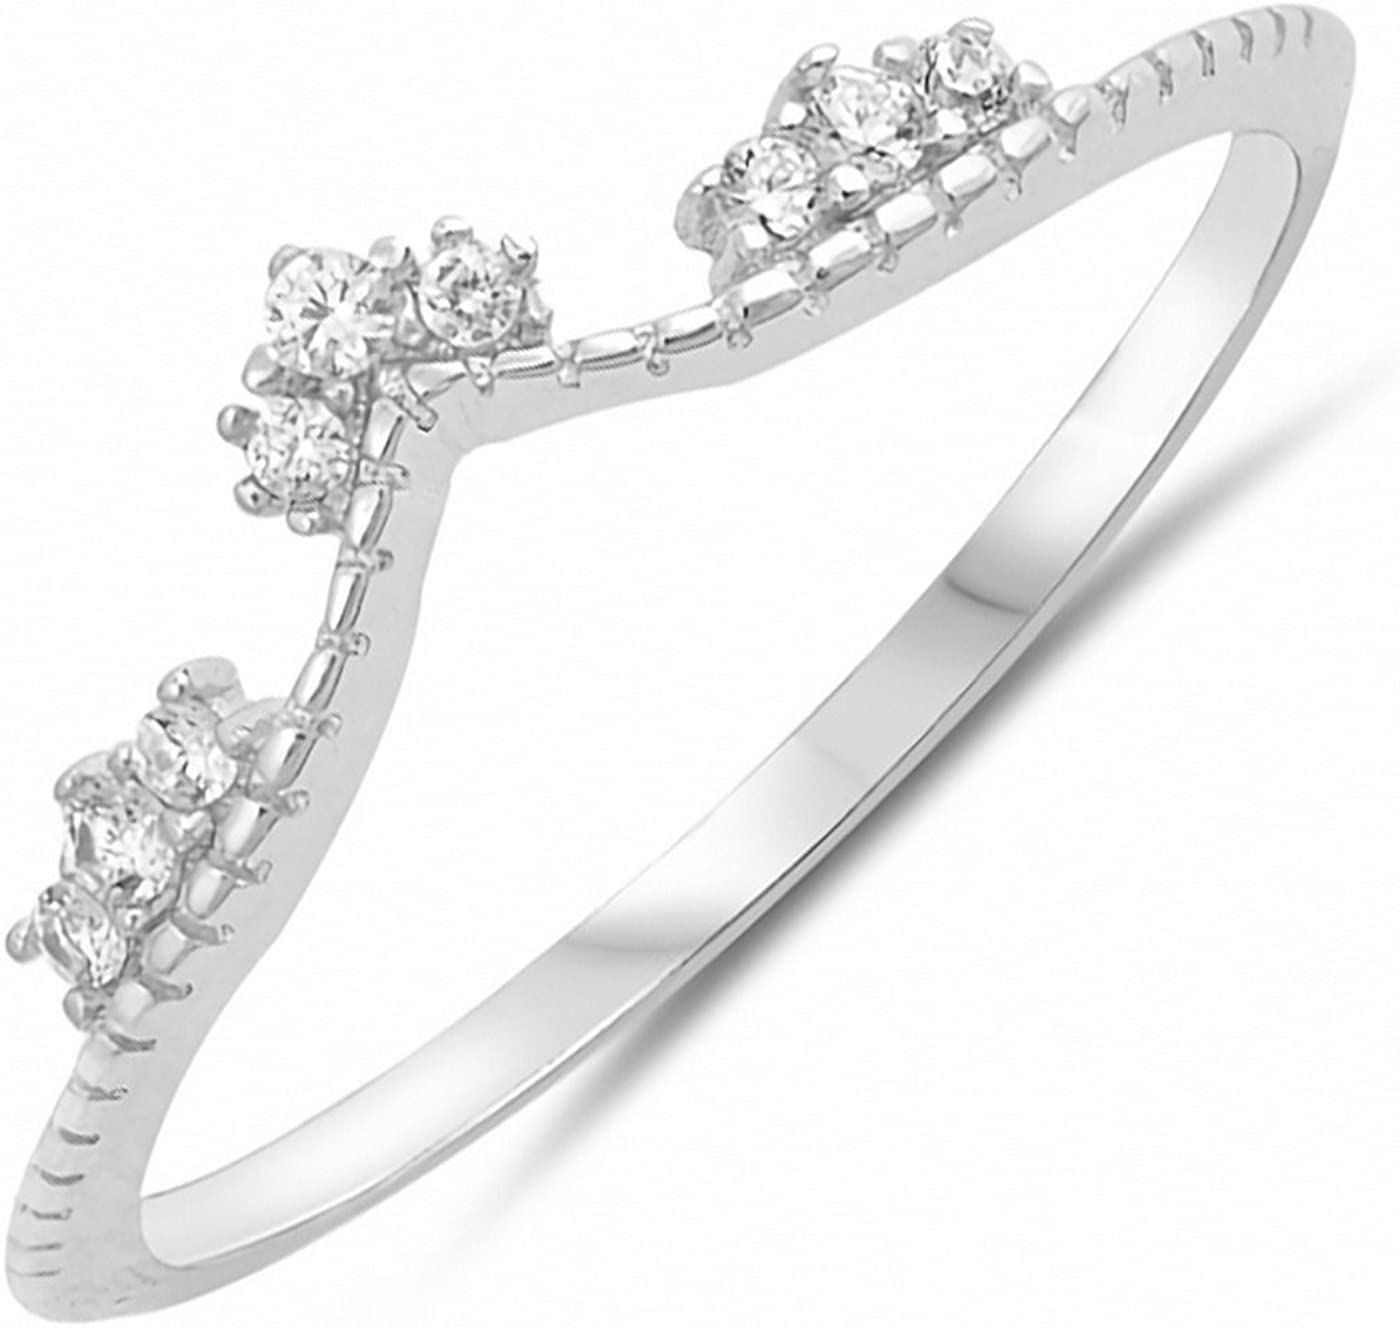 Cubic Zirconia Tiara .925 Sterling Silver Ring Sizes 4-10